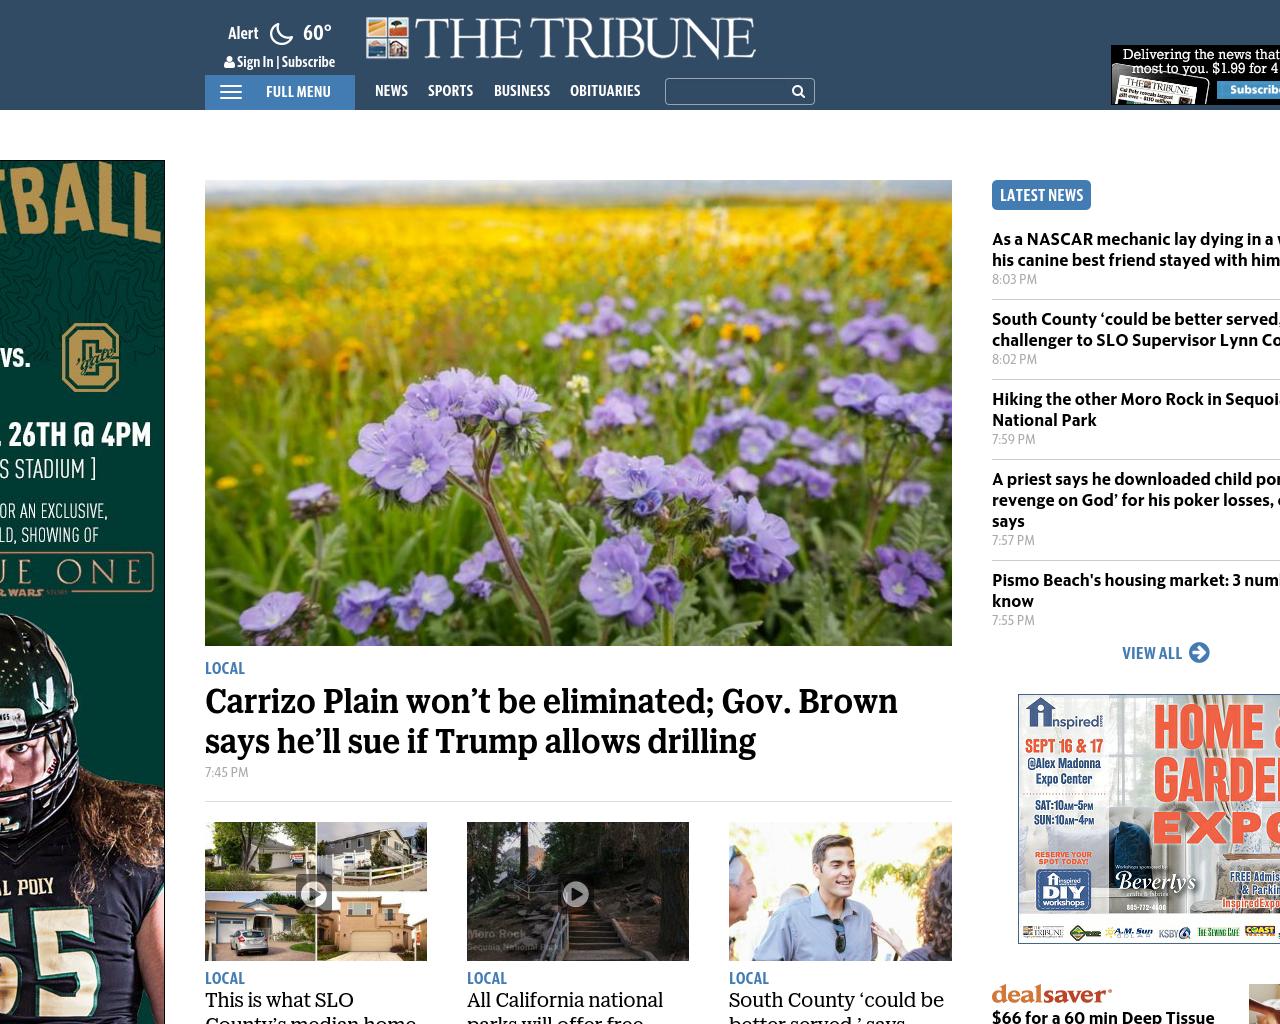 The-Tribune-/-SanLuisObispo.com-Advertising-Reviews-Pricing